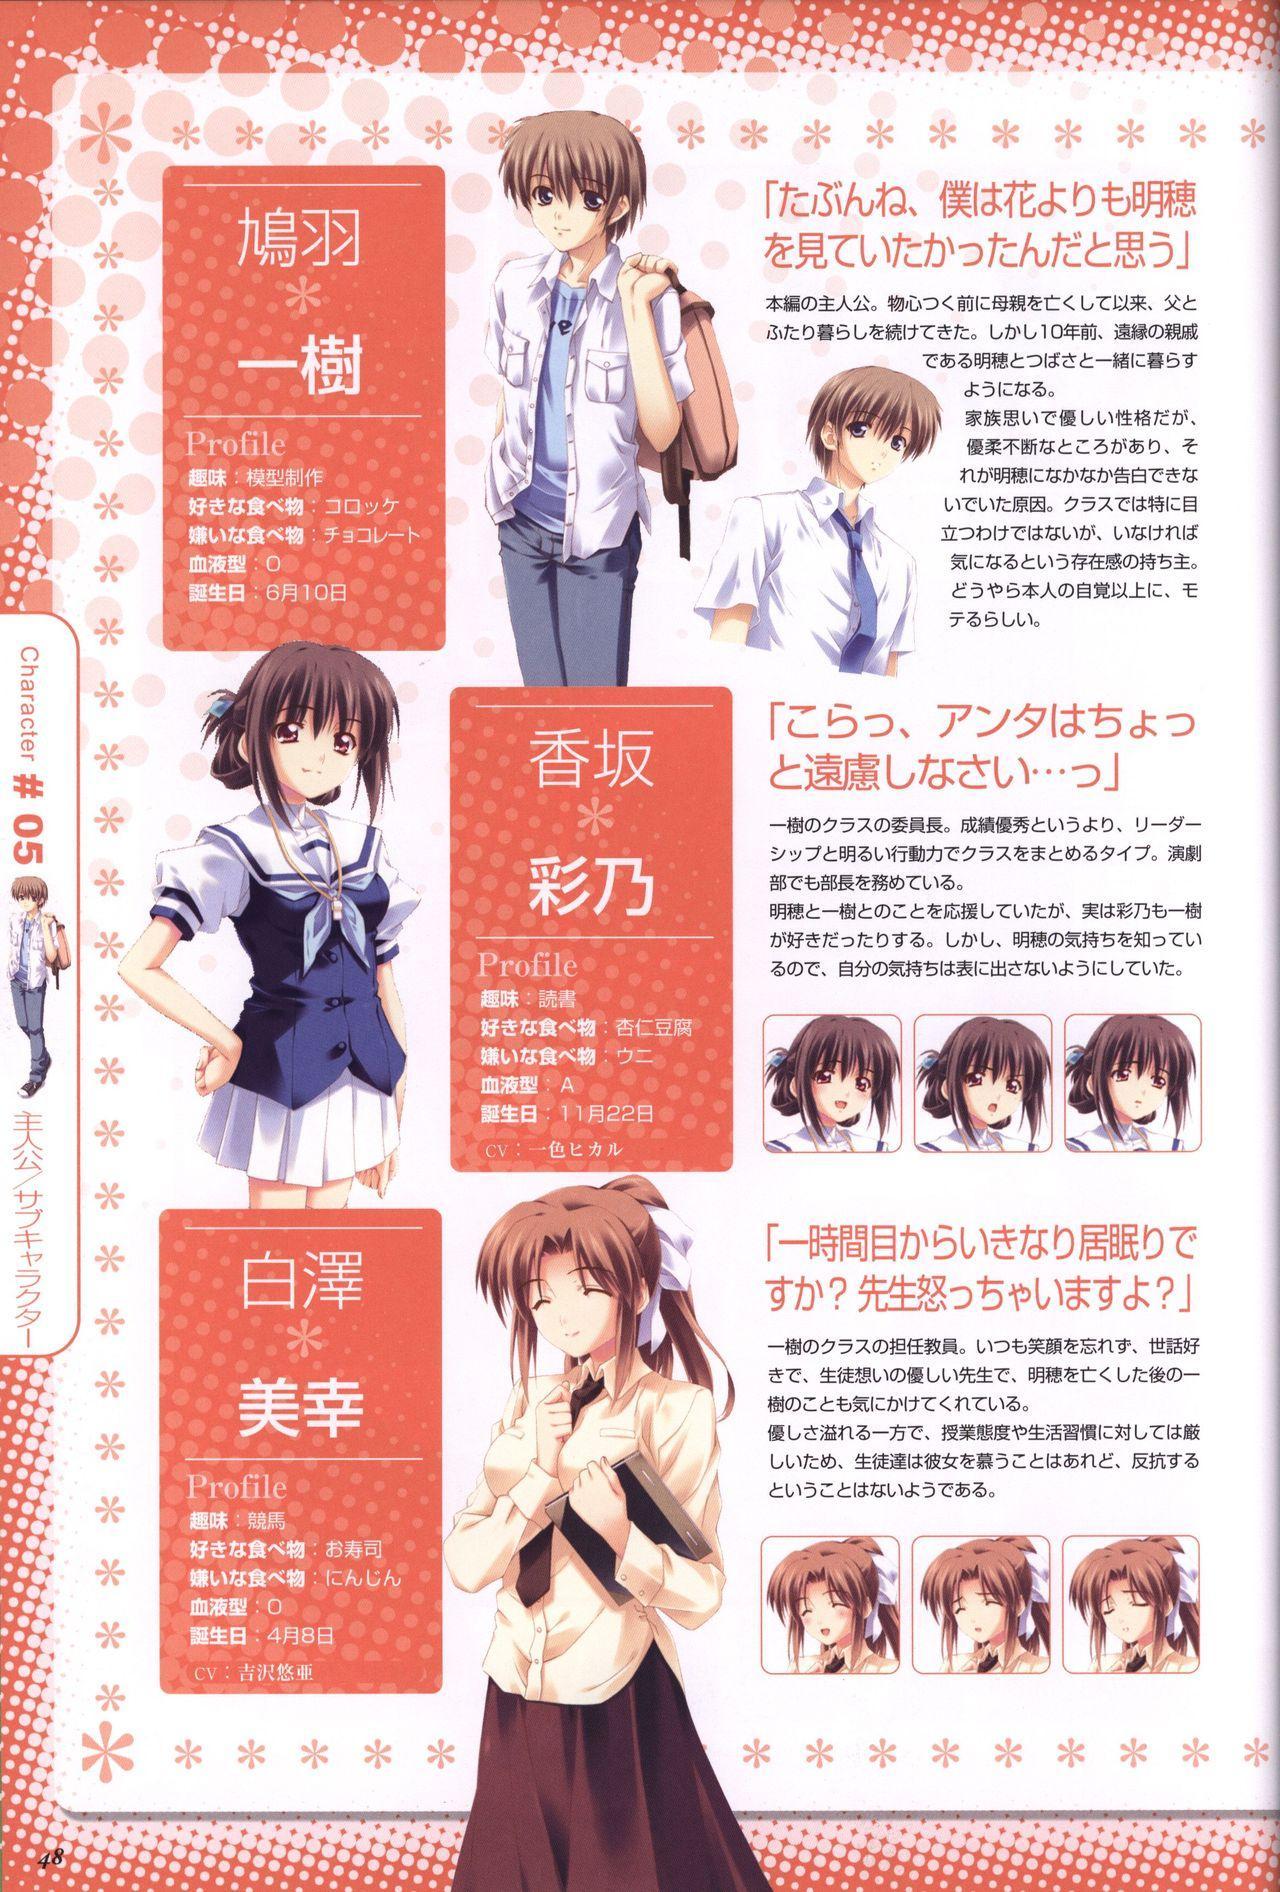 Moshimo Ashita ga Harenaraba official fanbook 48